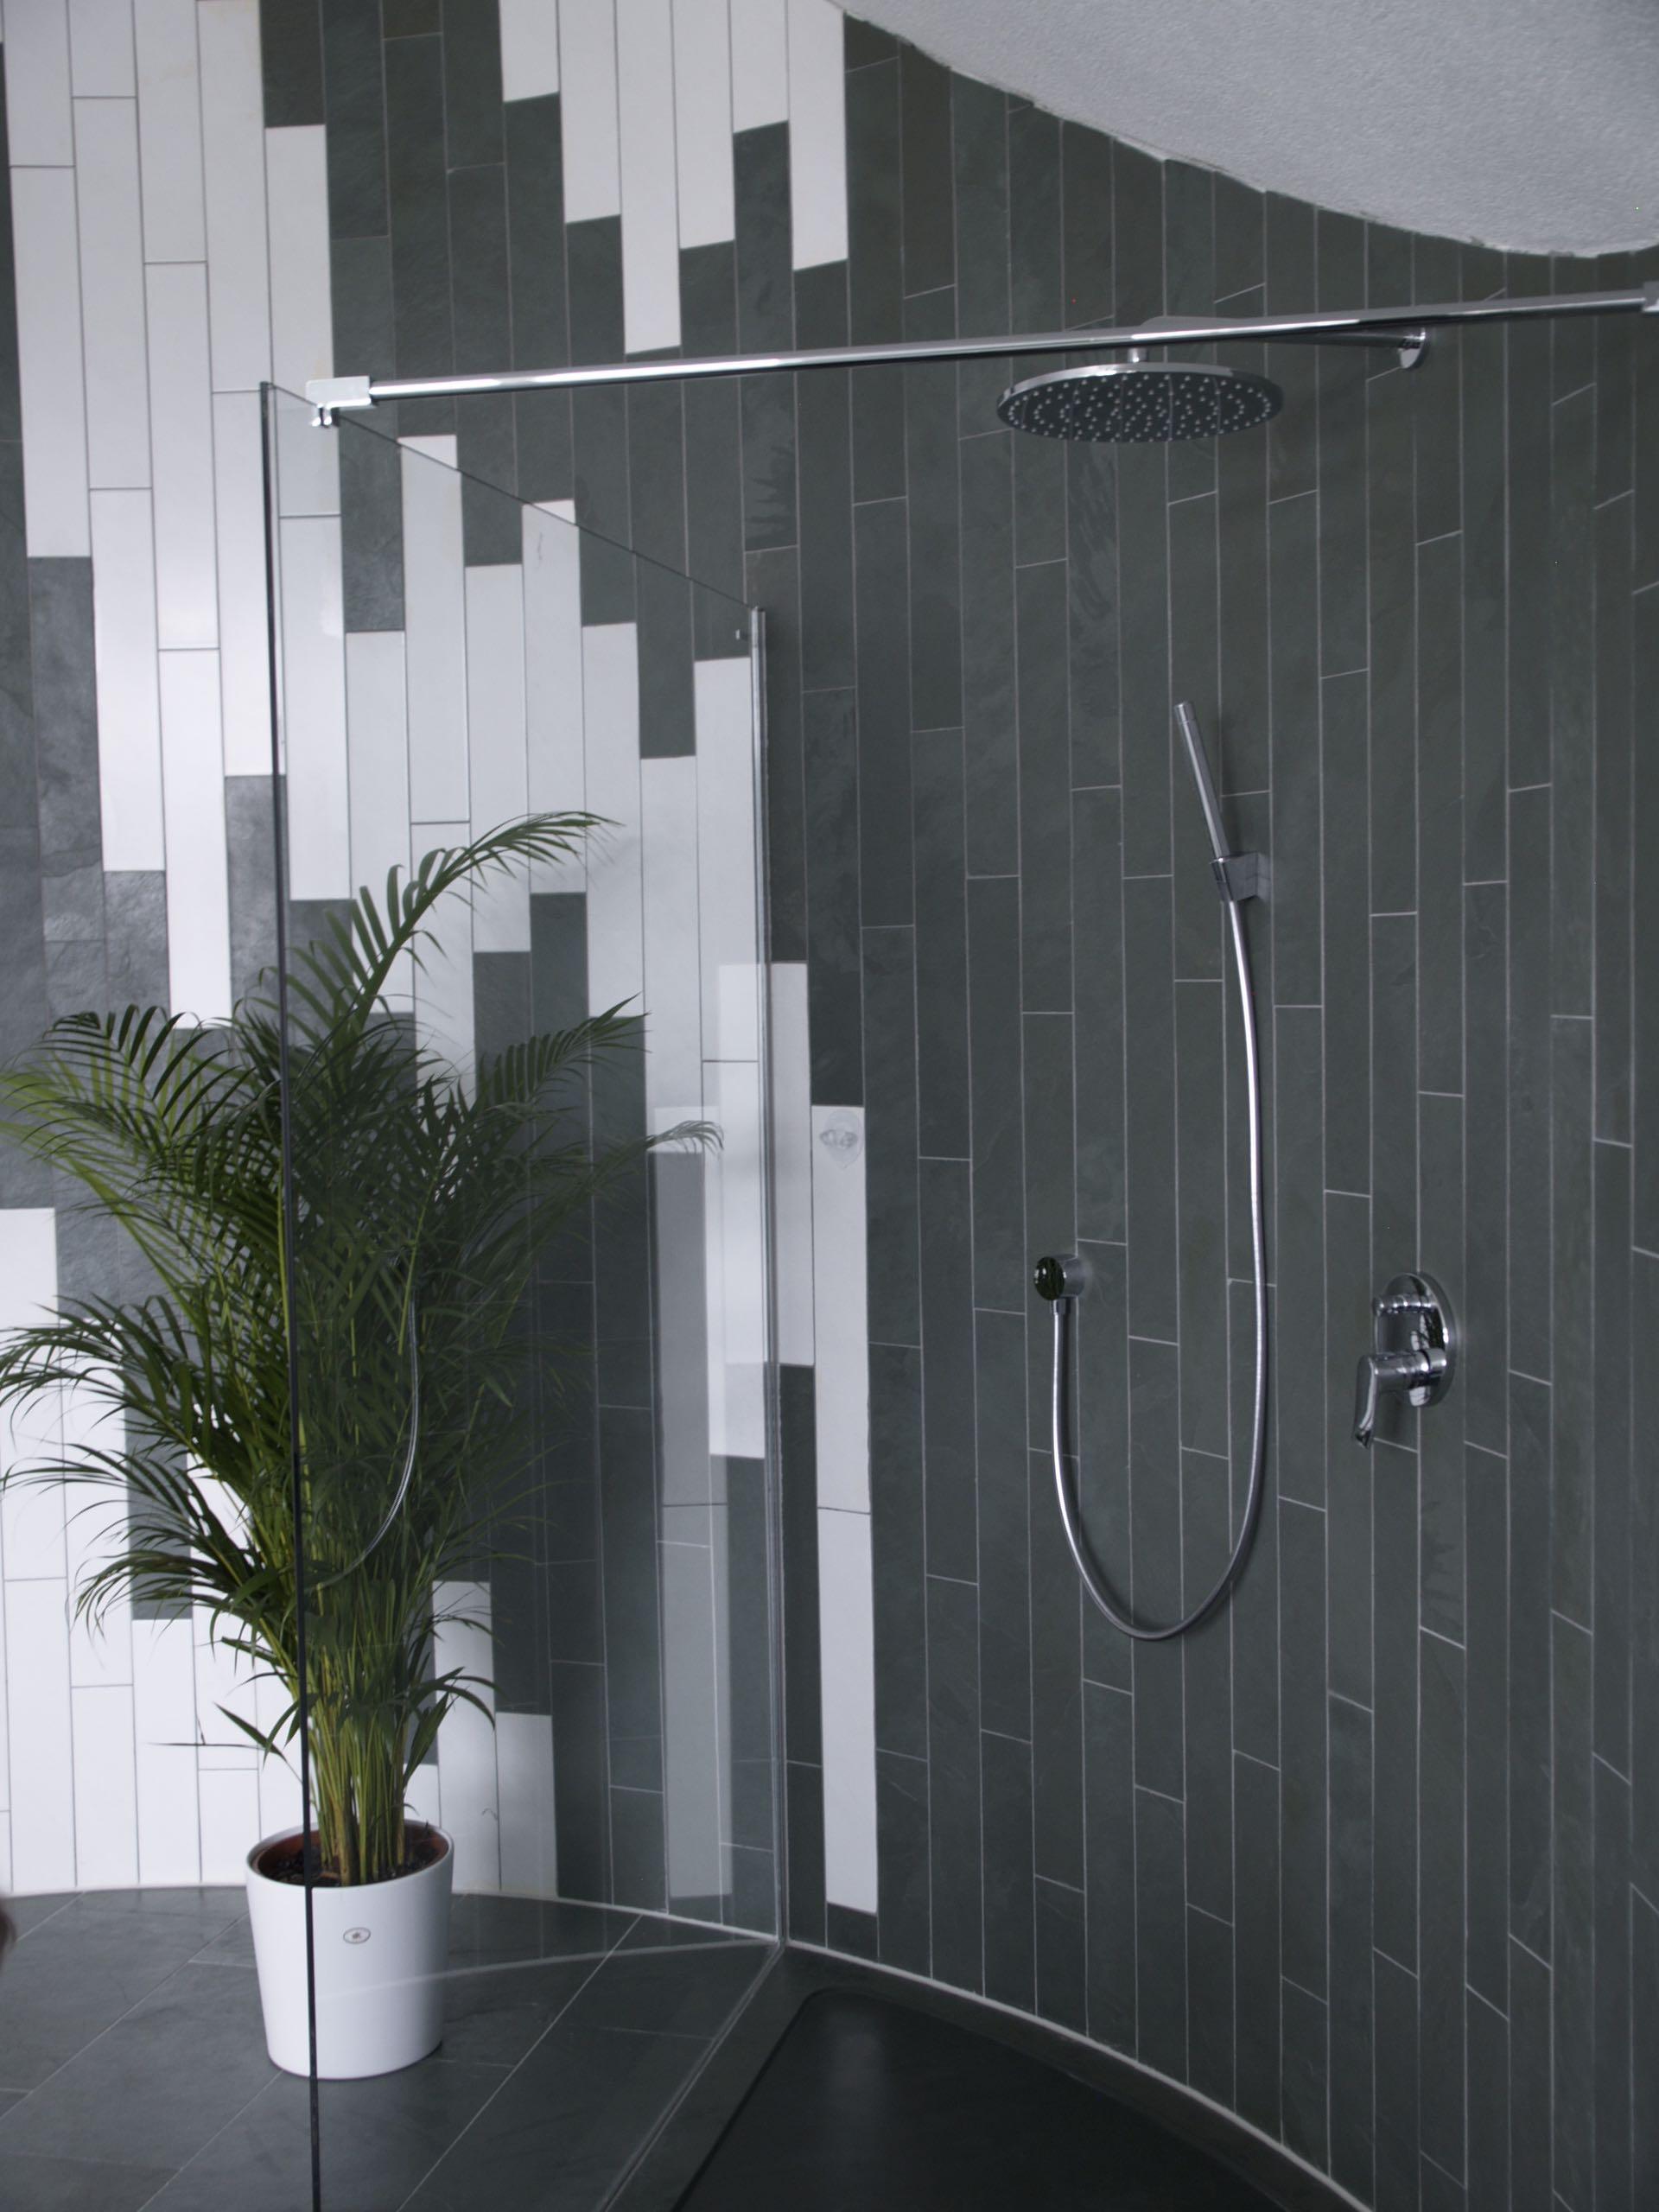 schiefer fliesen bad schiefer mustang fliesen in modernem badezimmer schiefer fliesen als. Black Bedroom Furniture Sets. Home Design Ideas